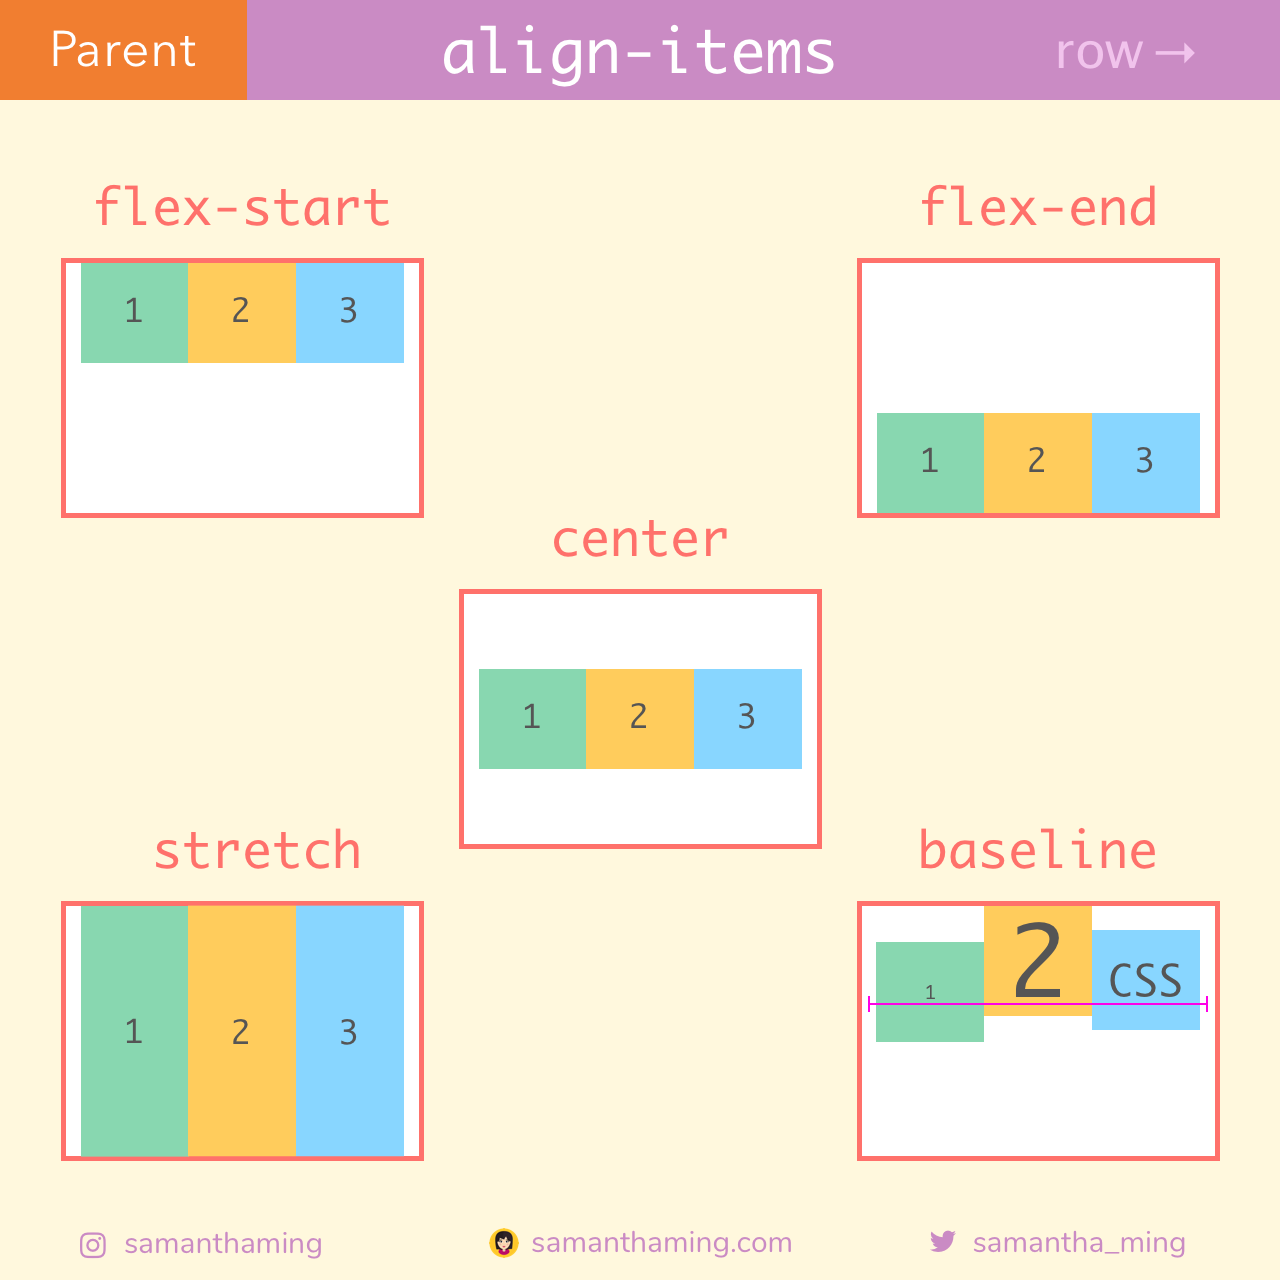 align-items row